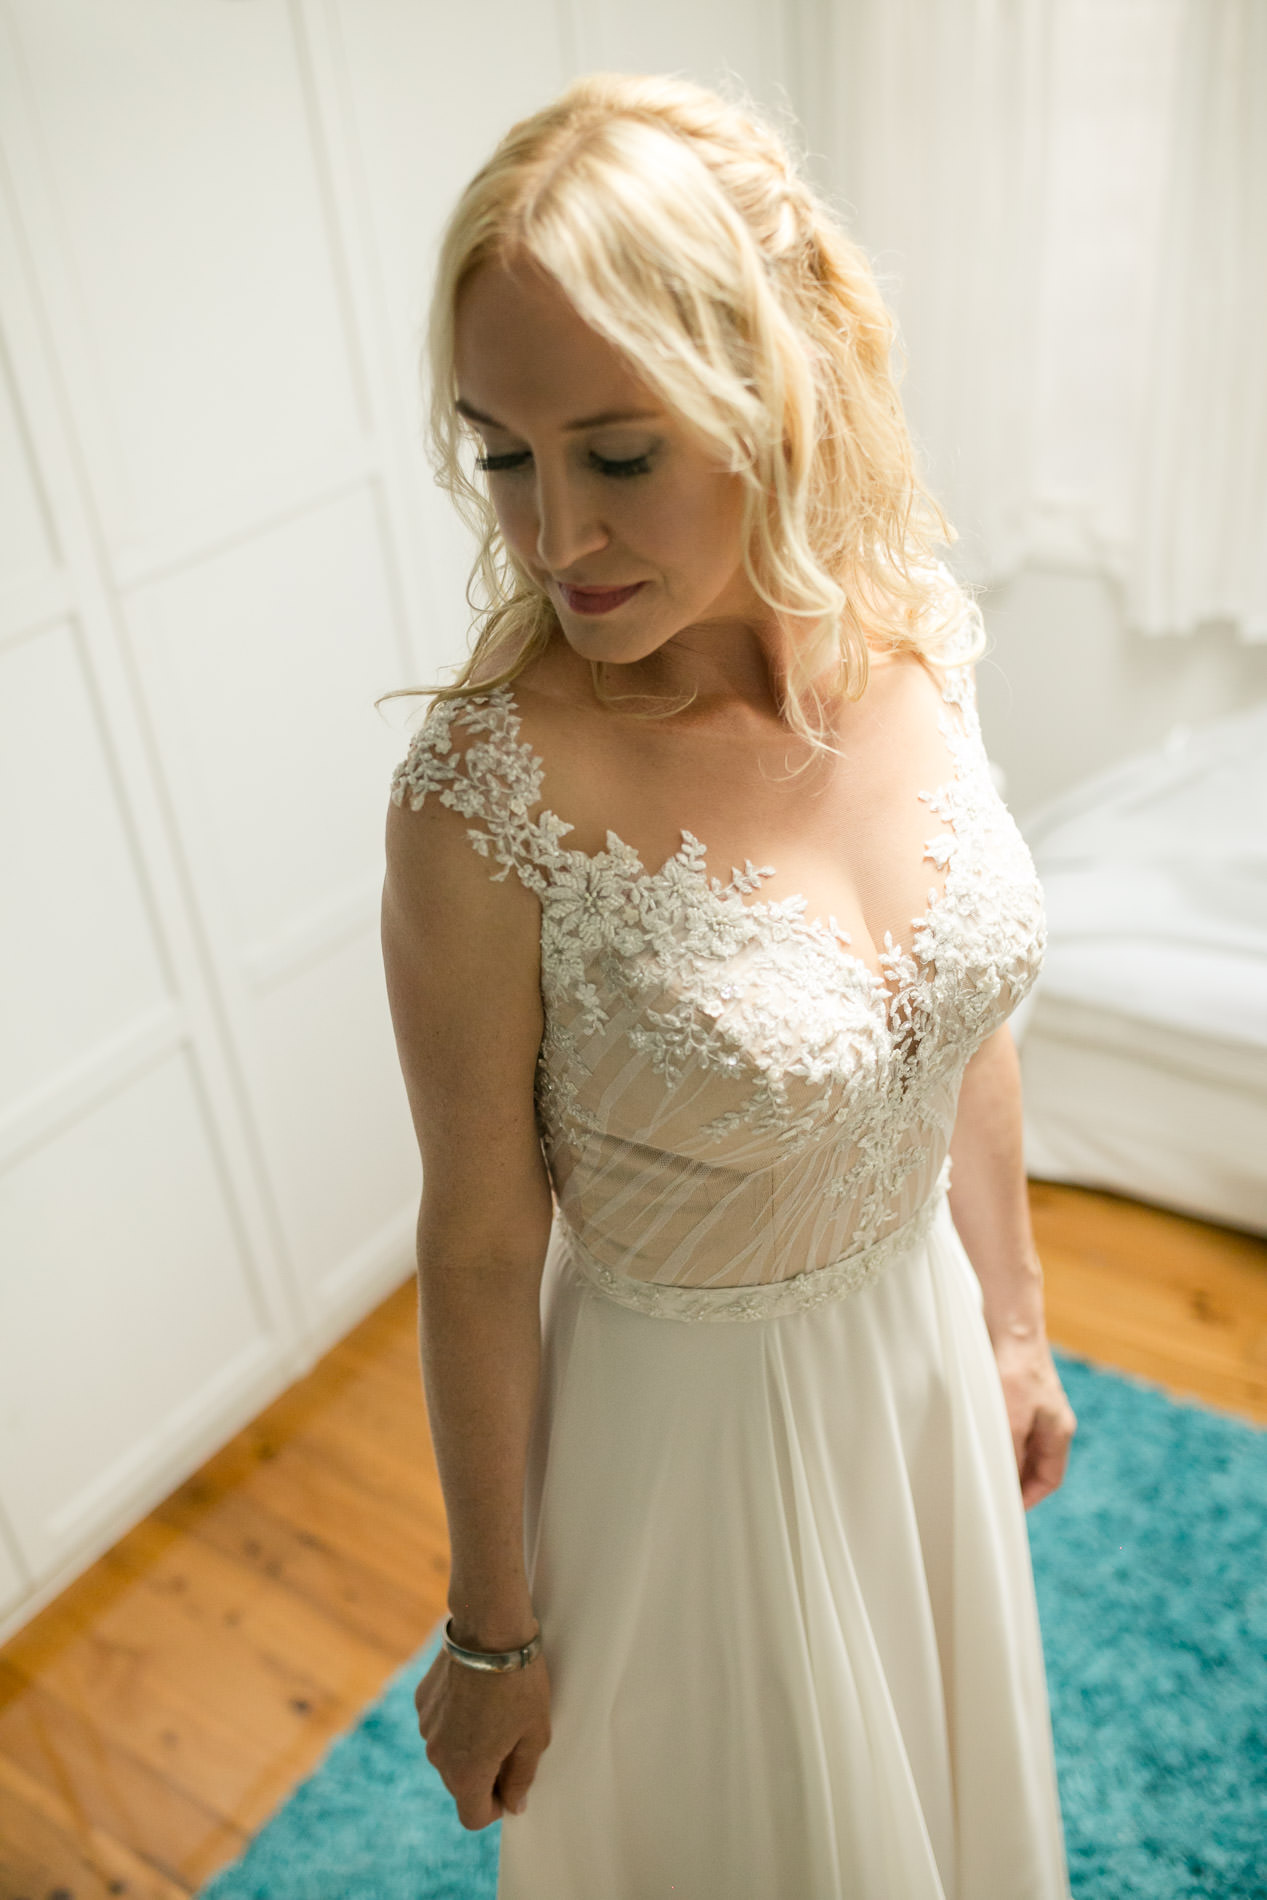 True North Photography_Boomerang Farm_Stacey and Isaac_Gold Coast Wedding_Barm Wedding_Hinterland Wedding-51.jpg